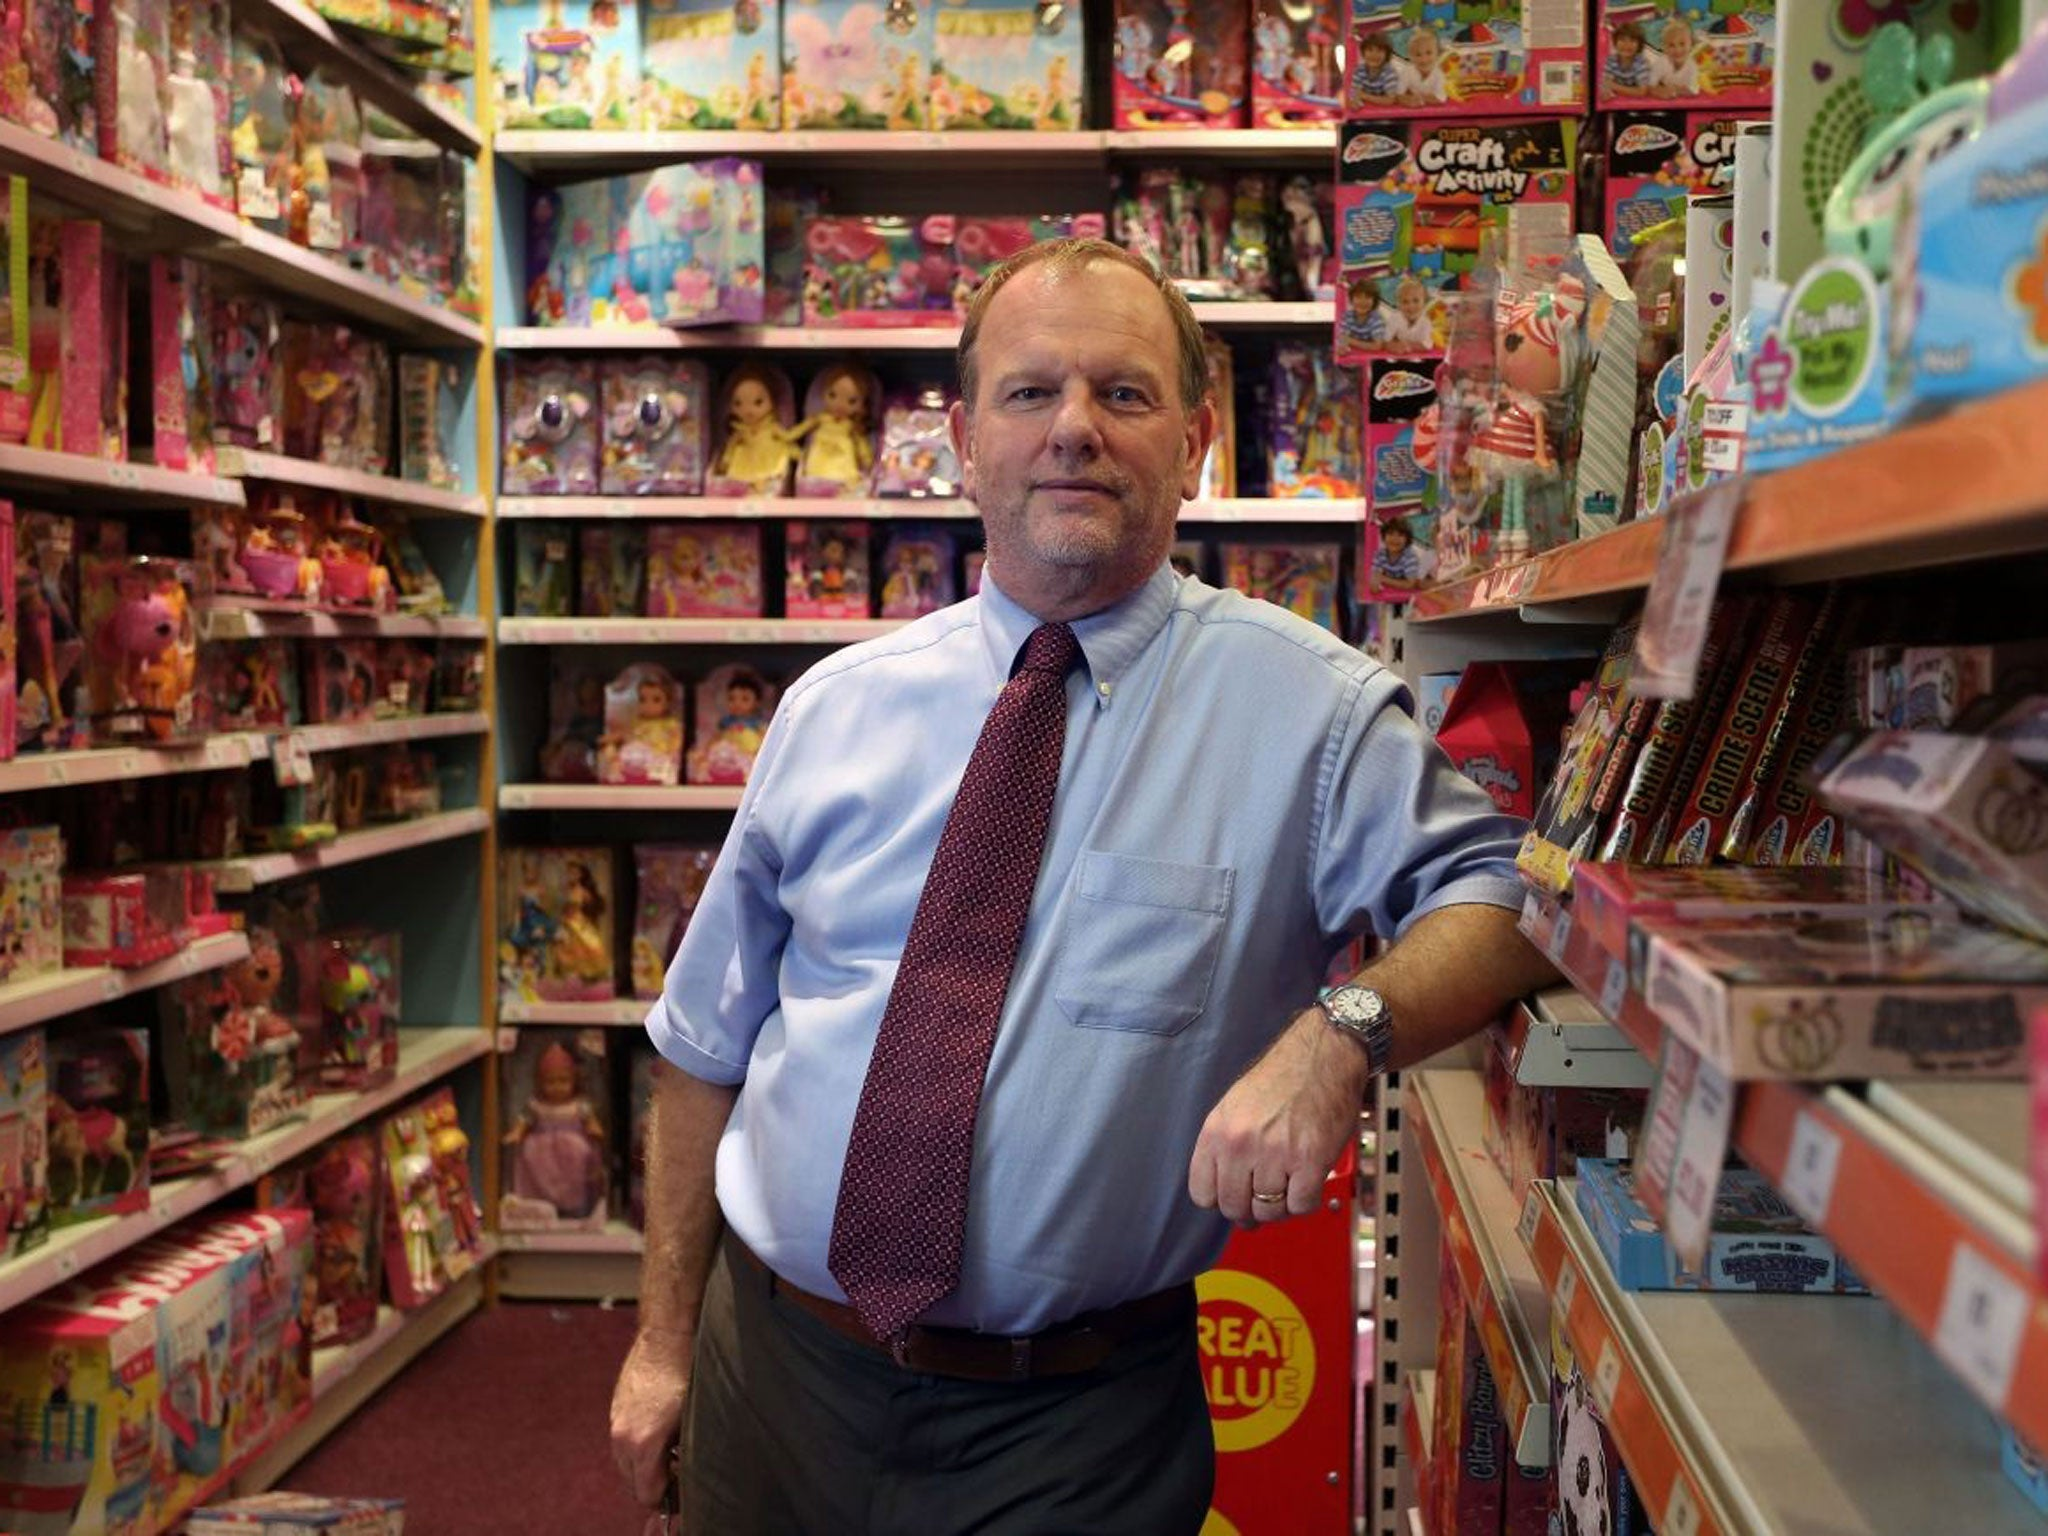 An open and shut case: Meet the toy-shop entrepreneur who puts Christian values before profit